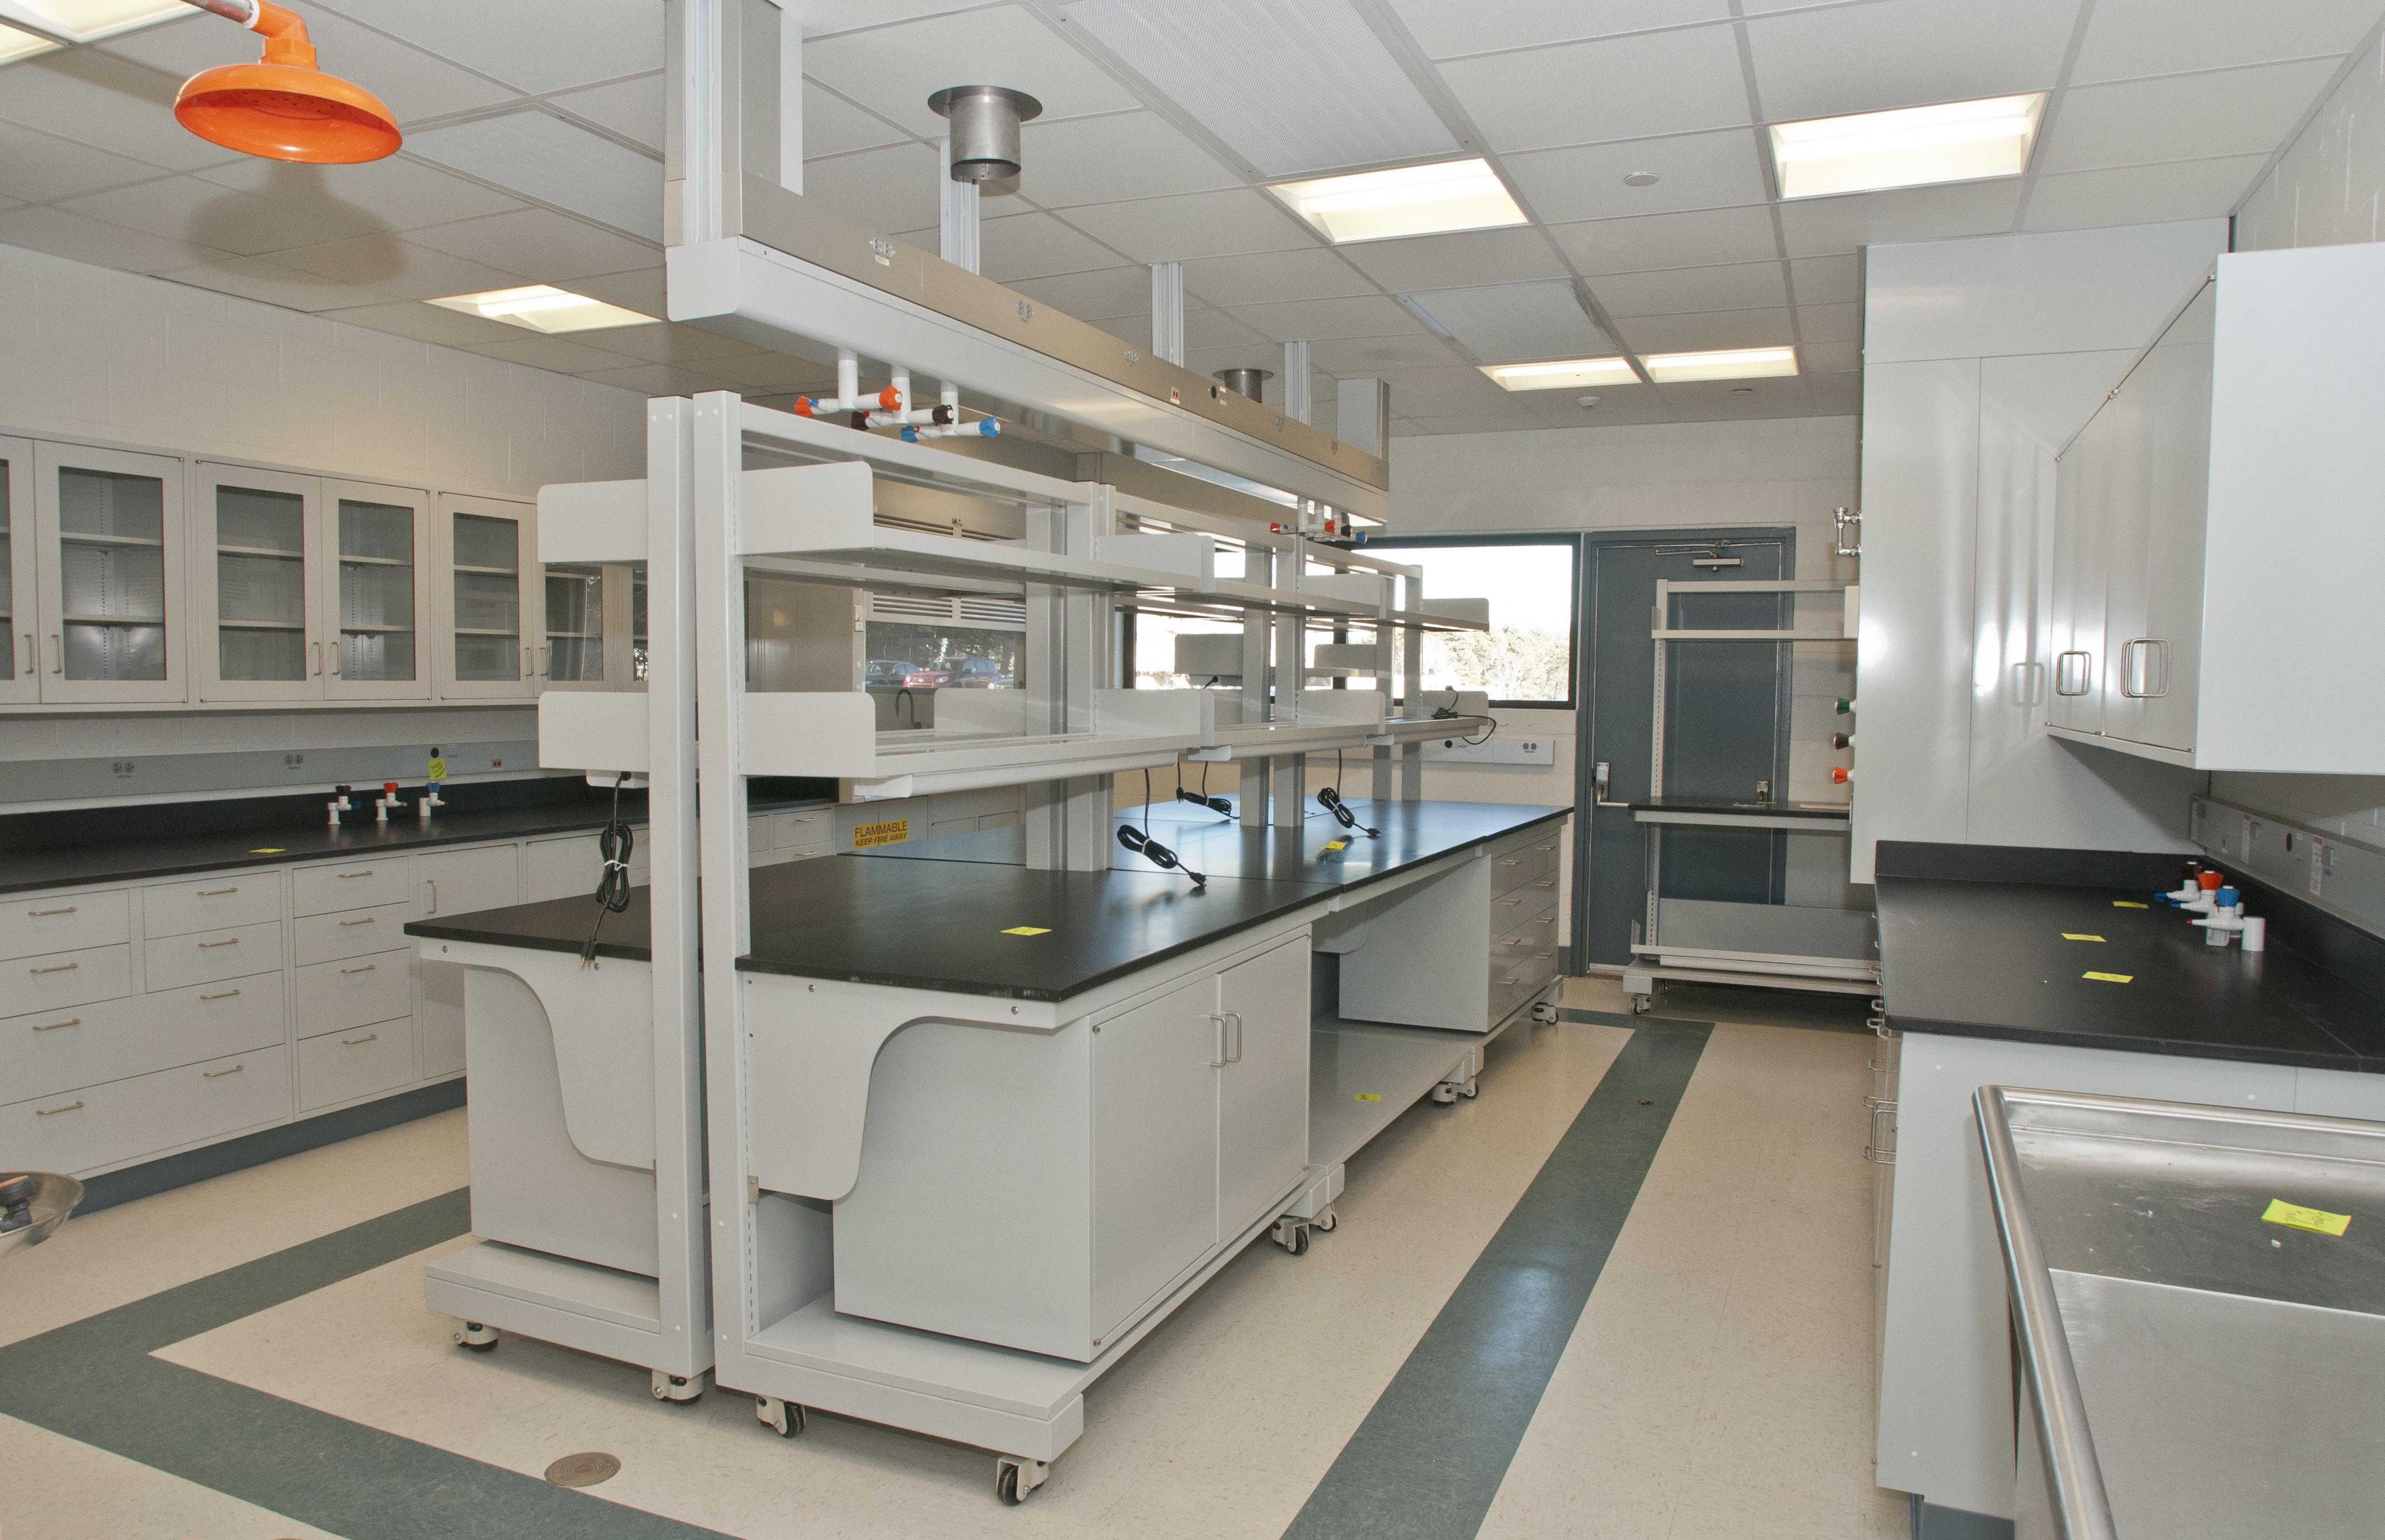 Brookhaven National Laboratory Completes Major Science Lab Renovation Bnl Newsroom